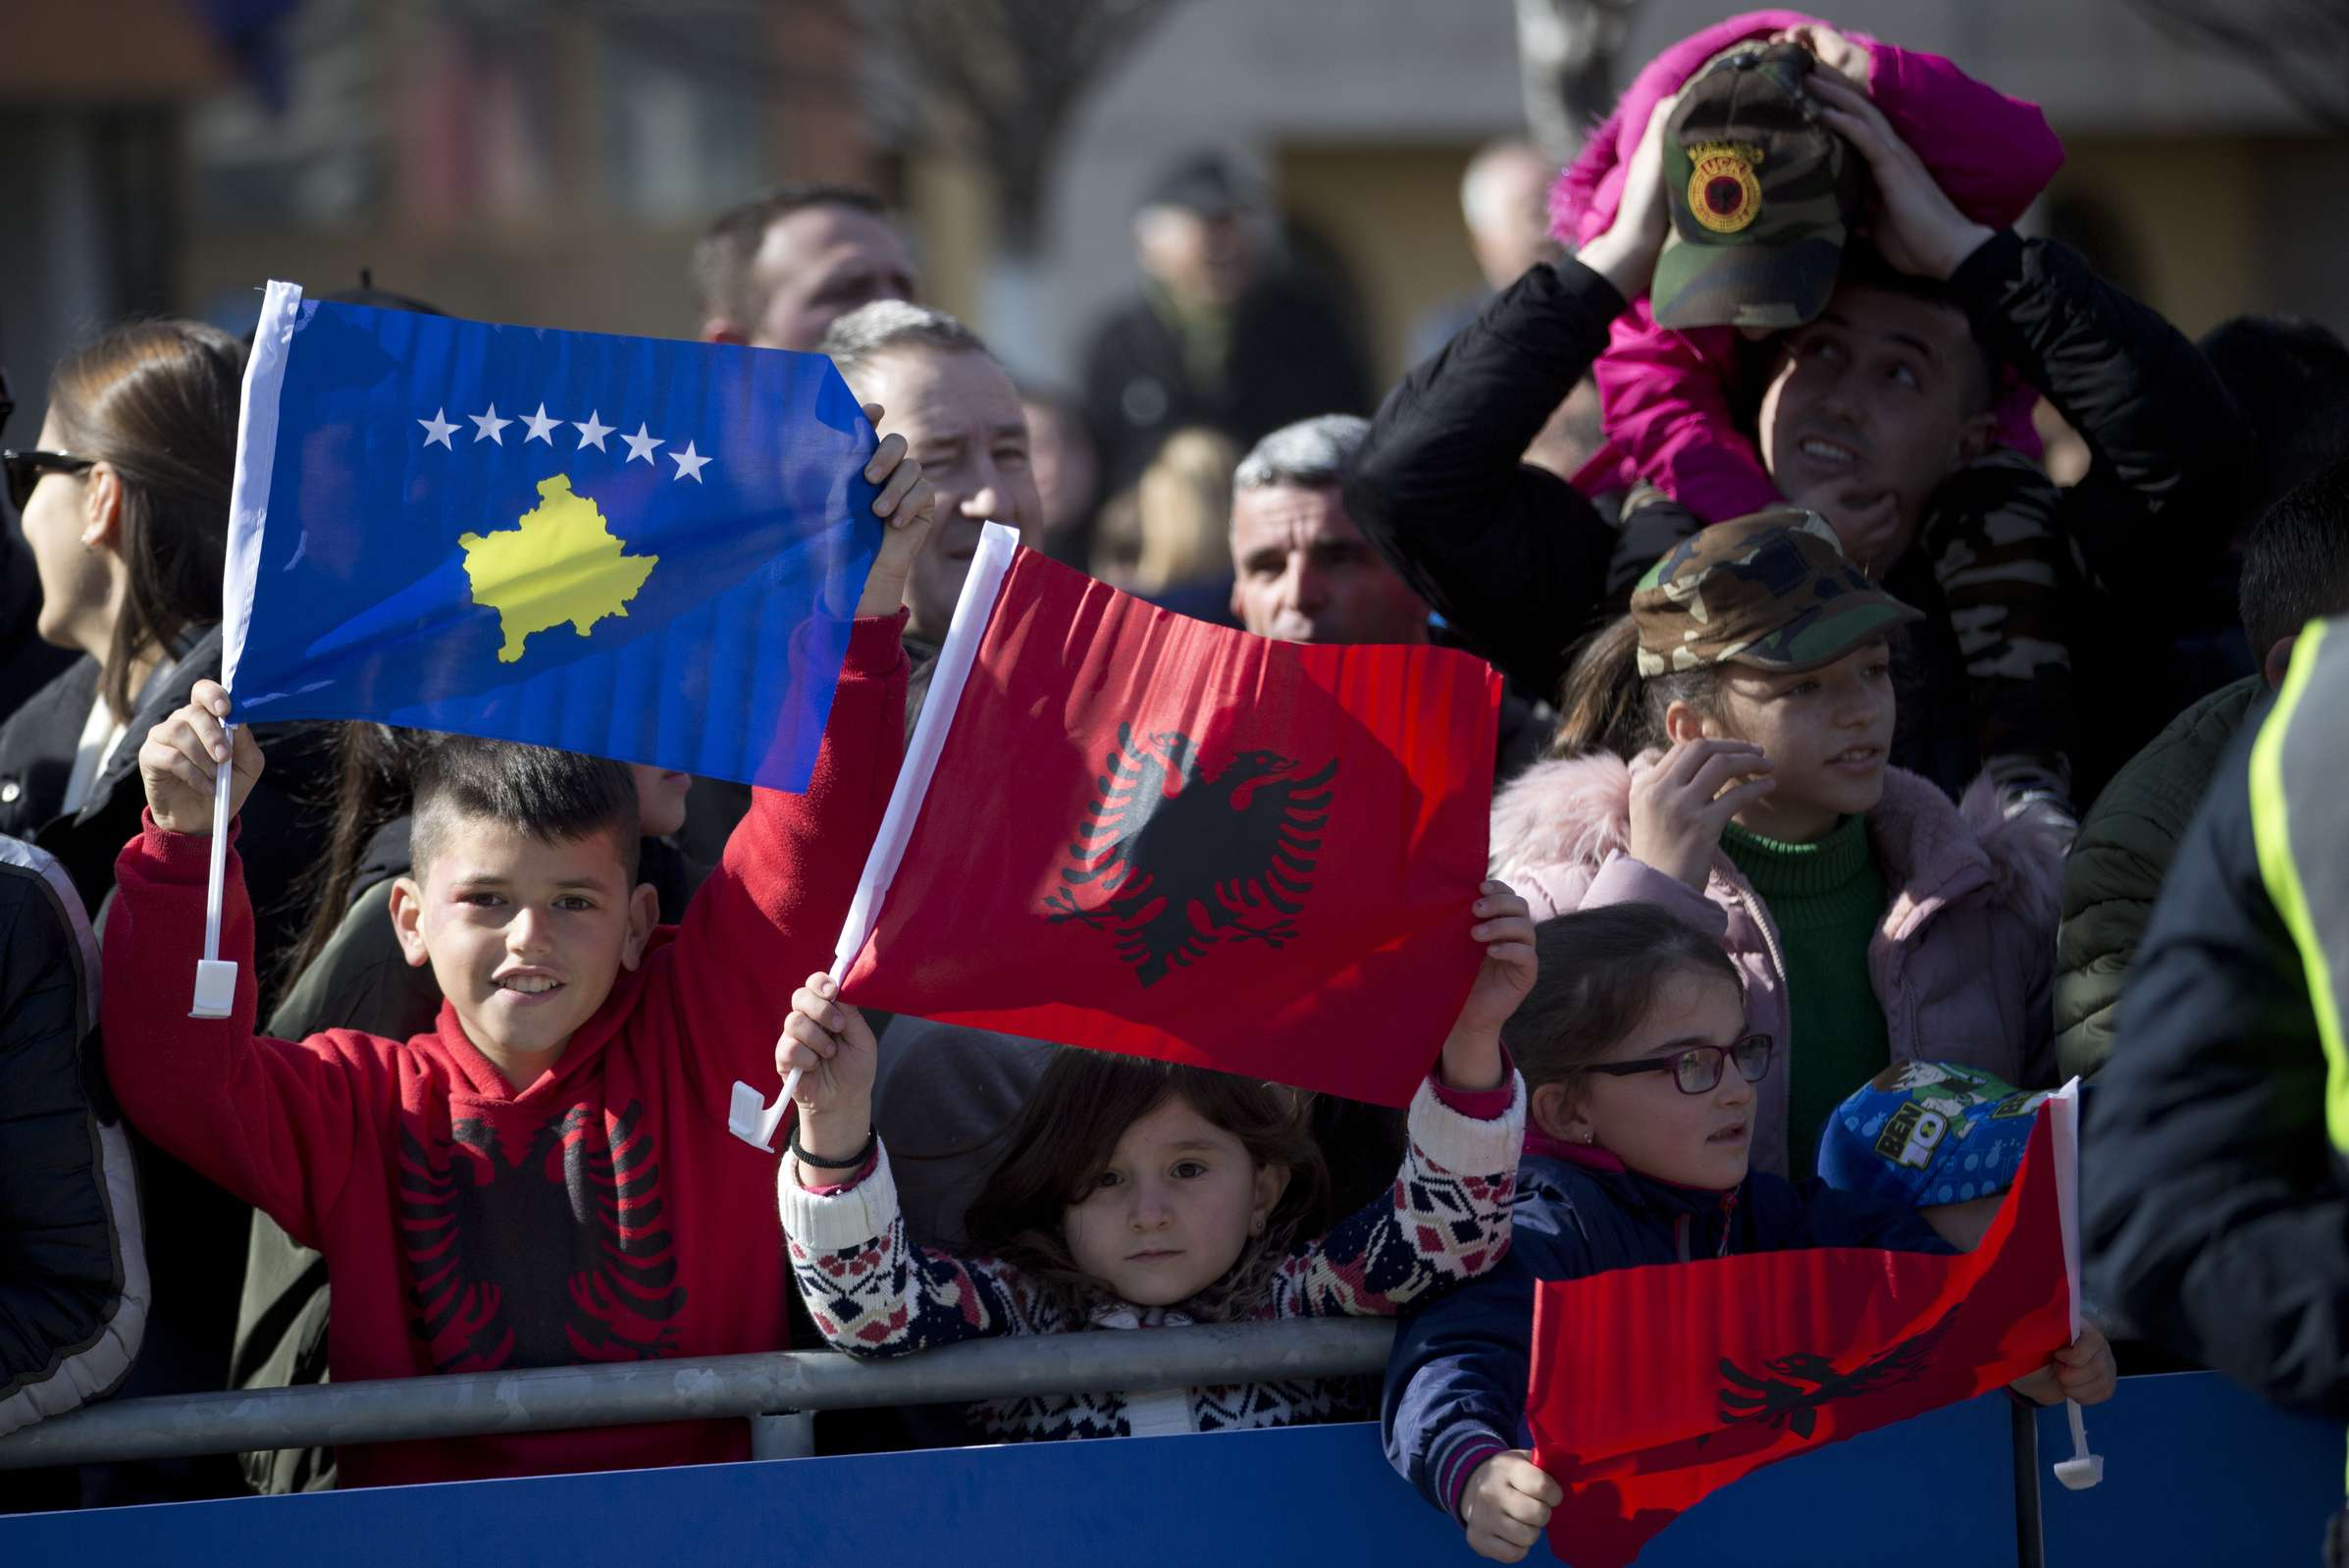 Cambia UEFA sede de juegos por rechazo de España a Kosovo